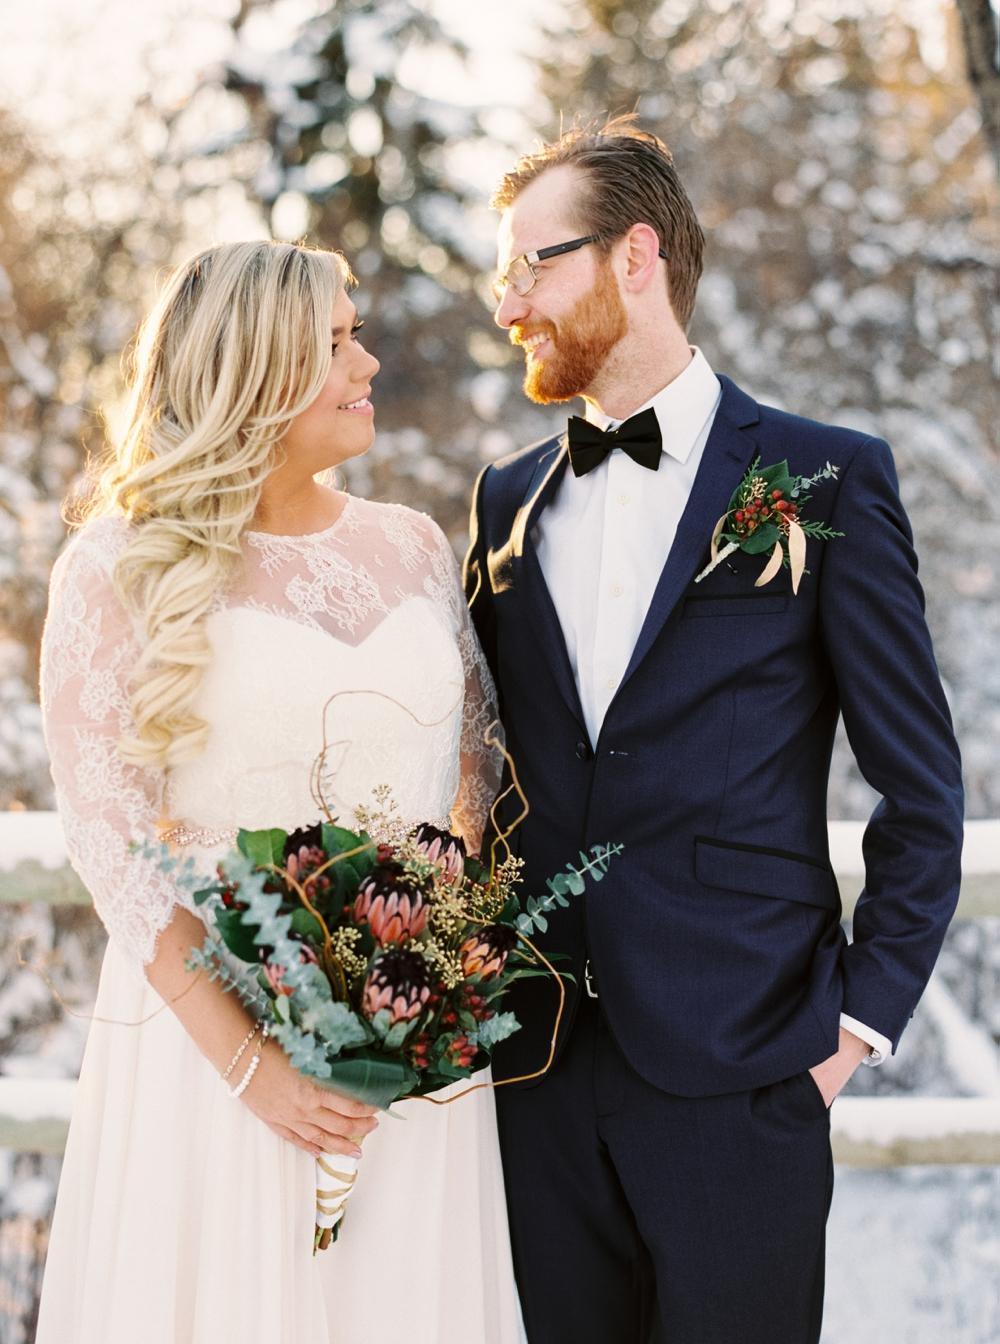 Calgary Wedding Photographers   New years Eve Wedding   Heritage Park guns Dairy Barn Wedding   Blush and Rose Gold   Winter Wedding